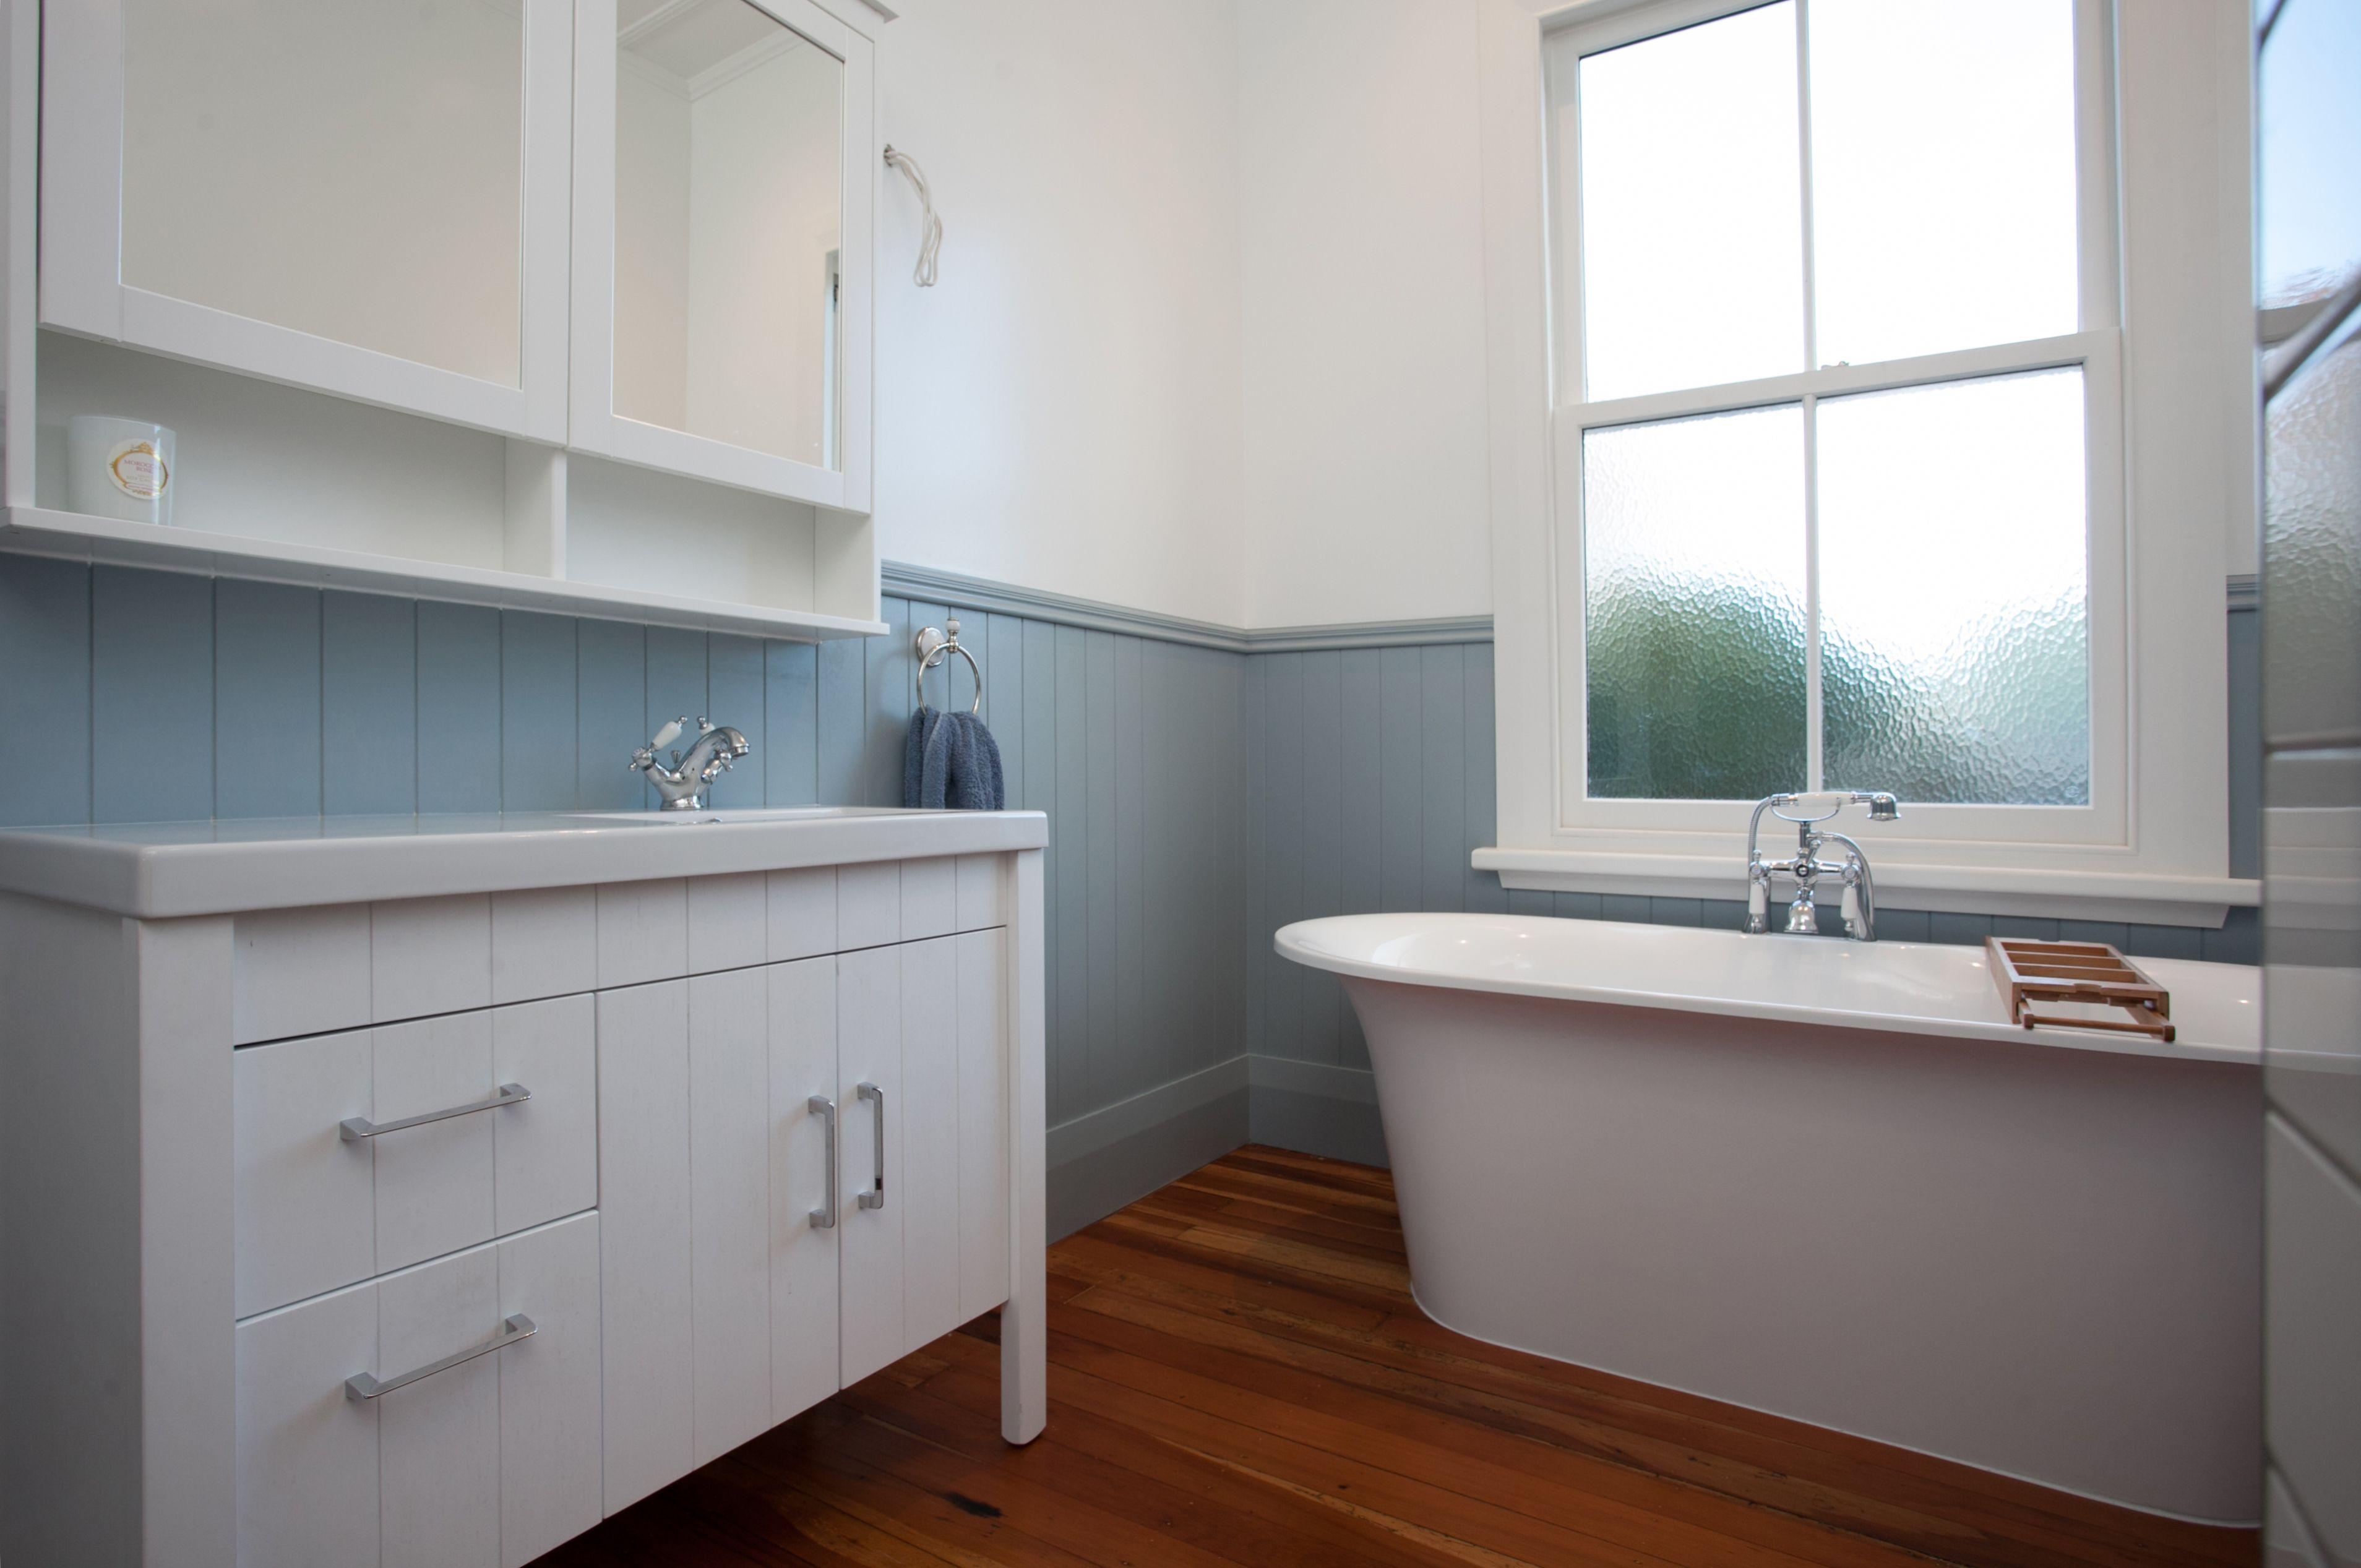 renovated bathroom to 1900 s villa cambridge new on bathroom renovation ideas nz id=14393